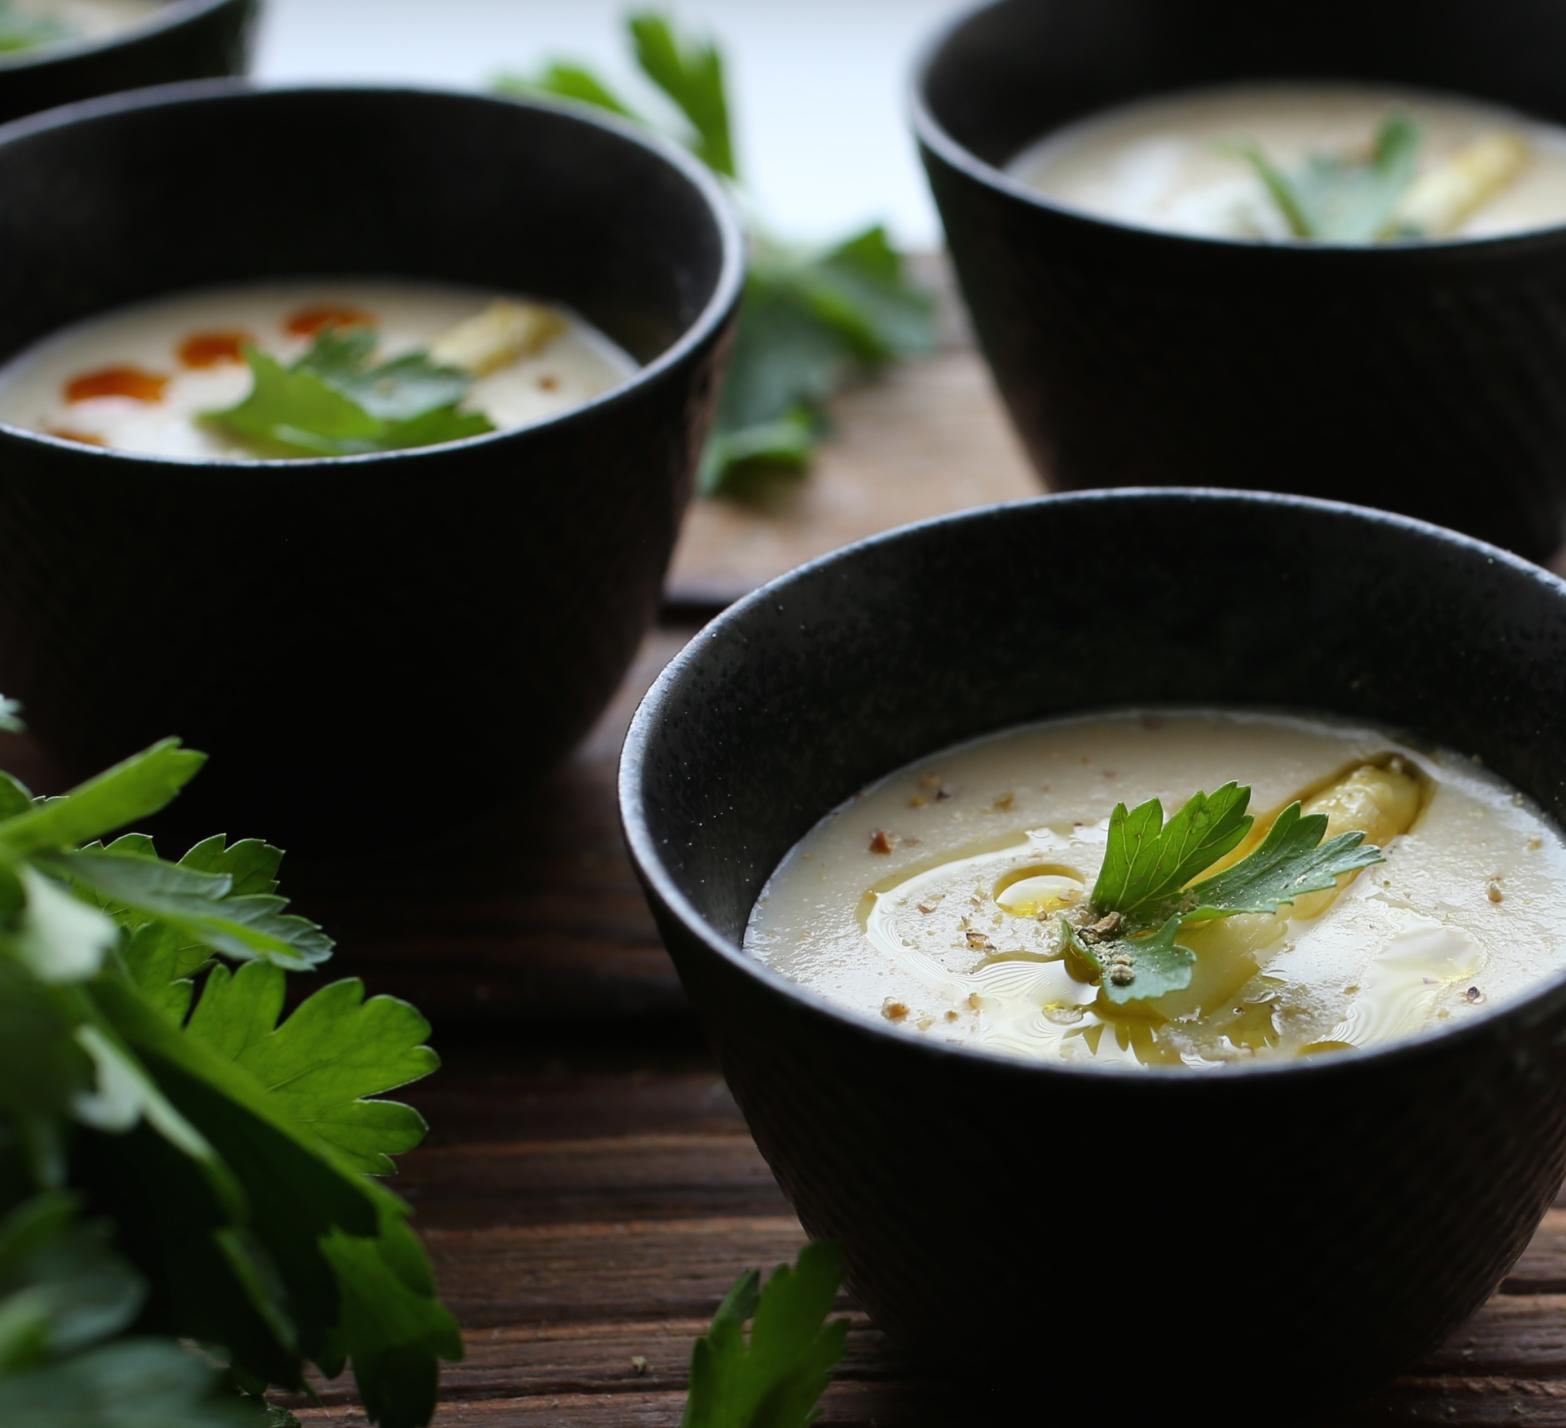 Creamy White Asparagus Soup